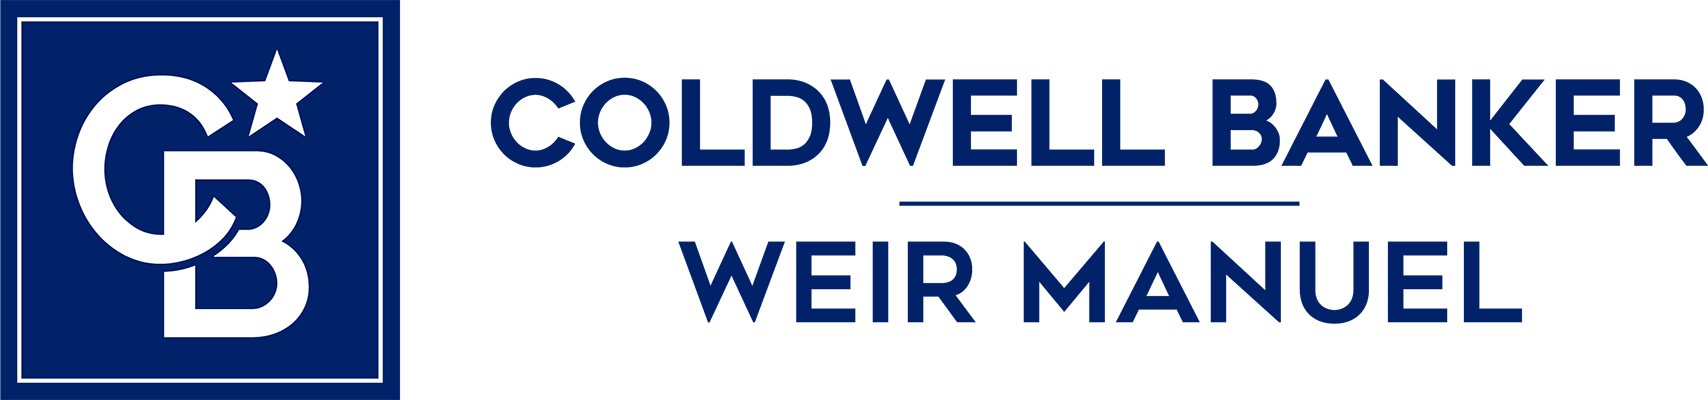 Coldwell Banker Weir Manuel Logo